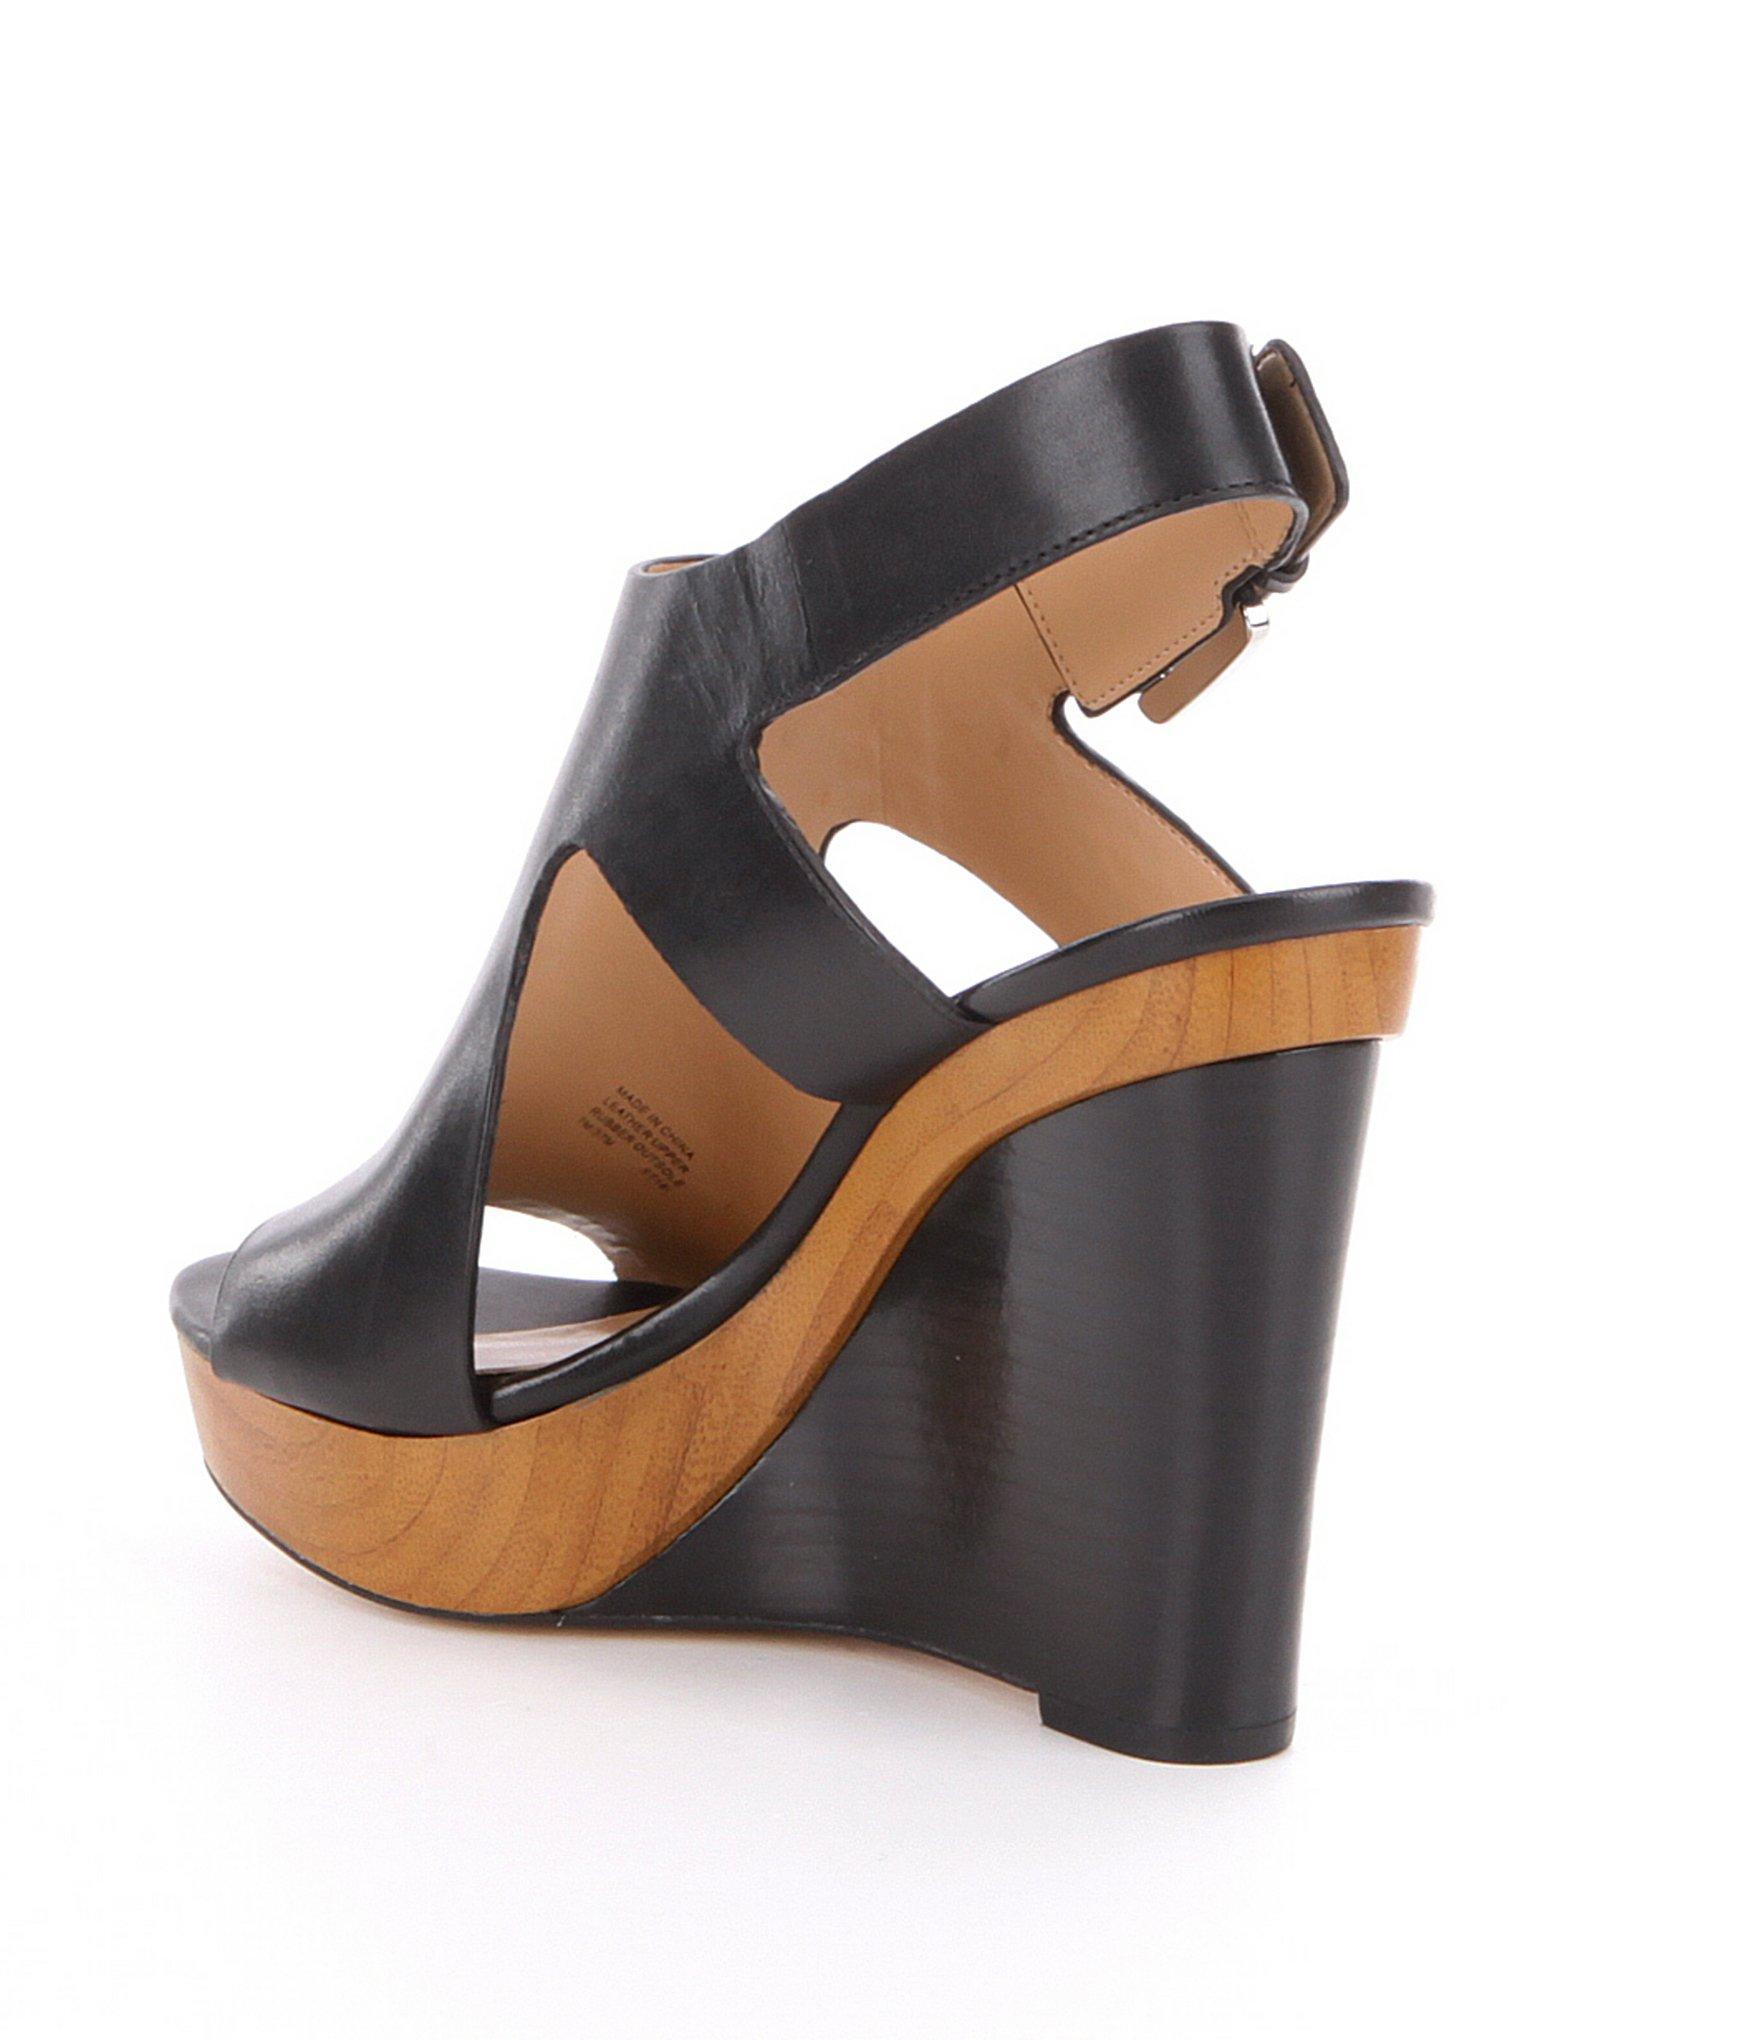 Josephine Leather Peep Toe Wedges Y32O5UL7QO